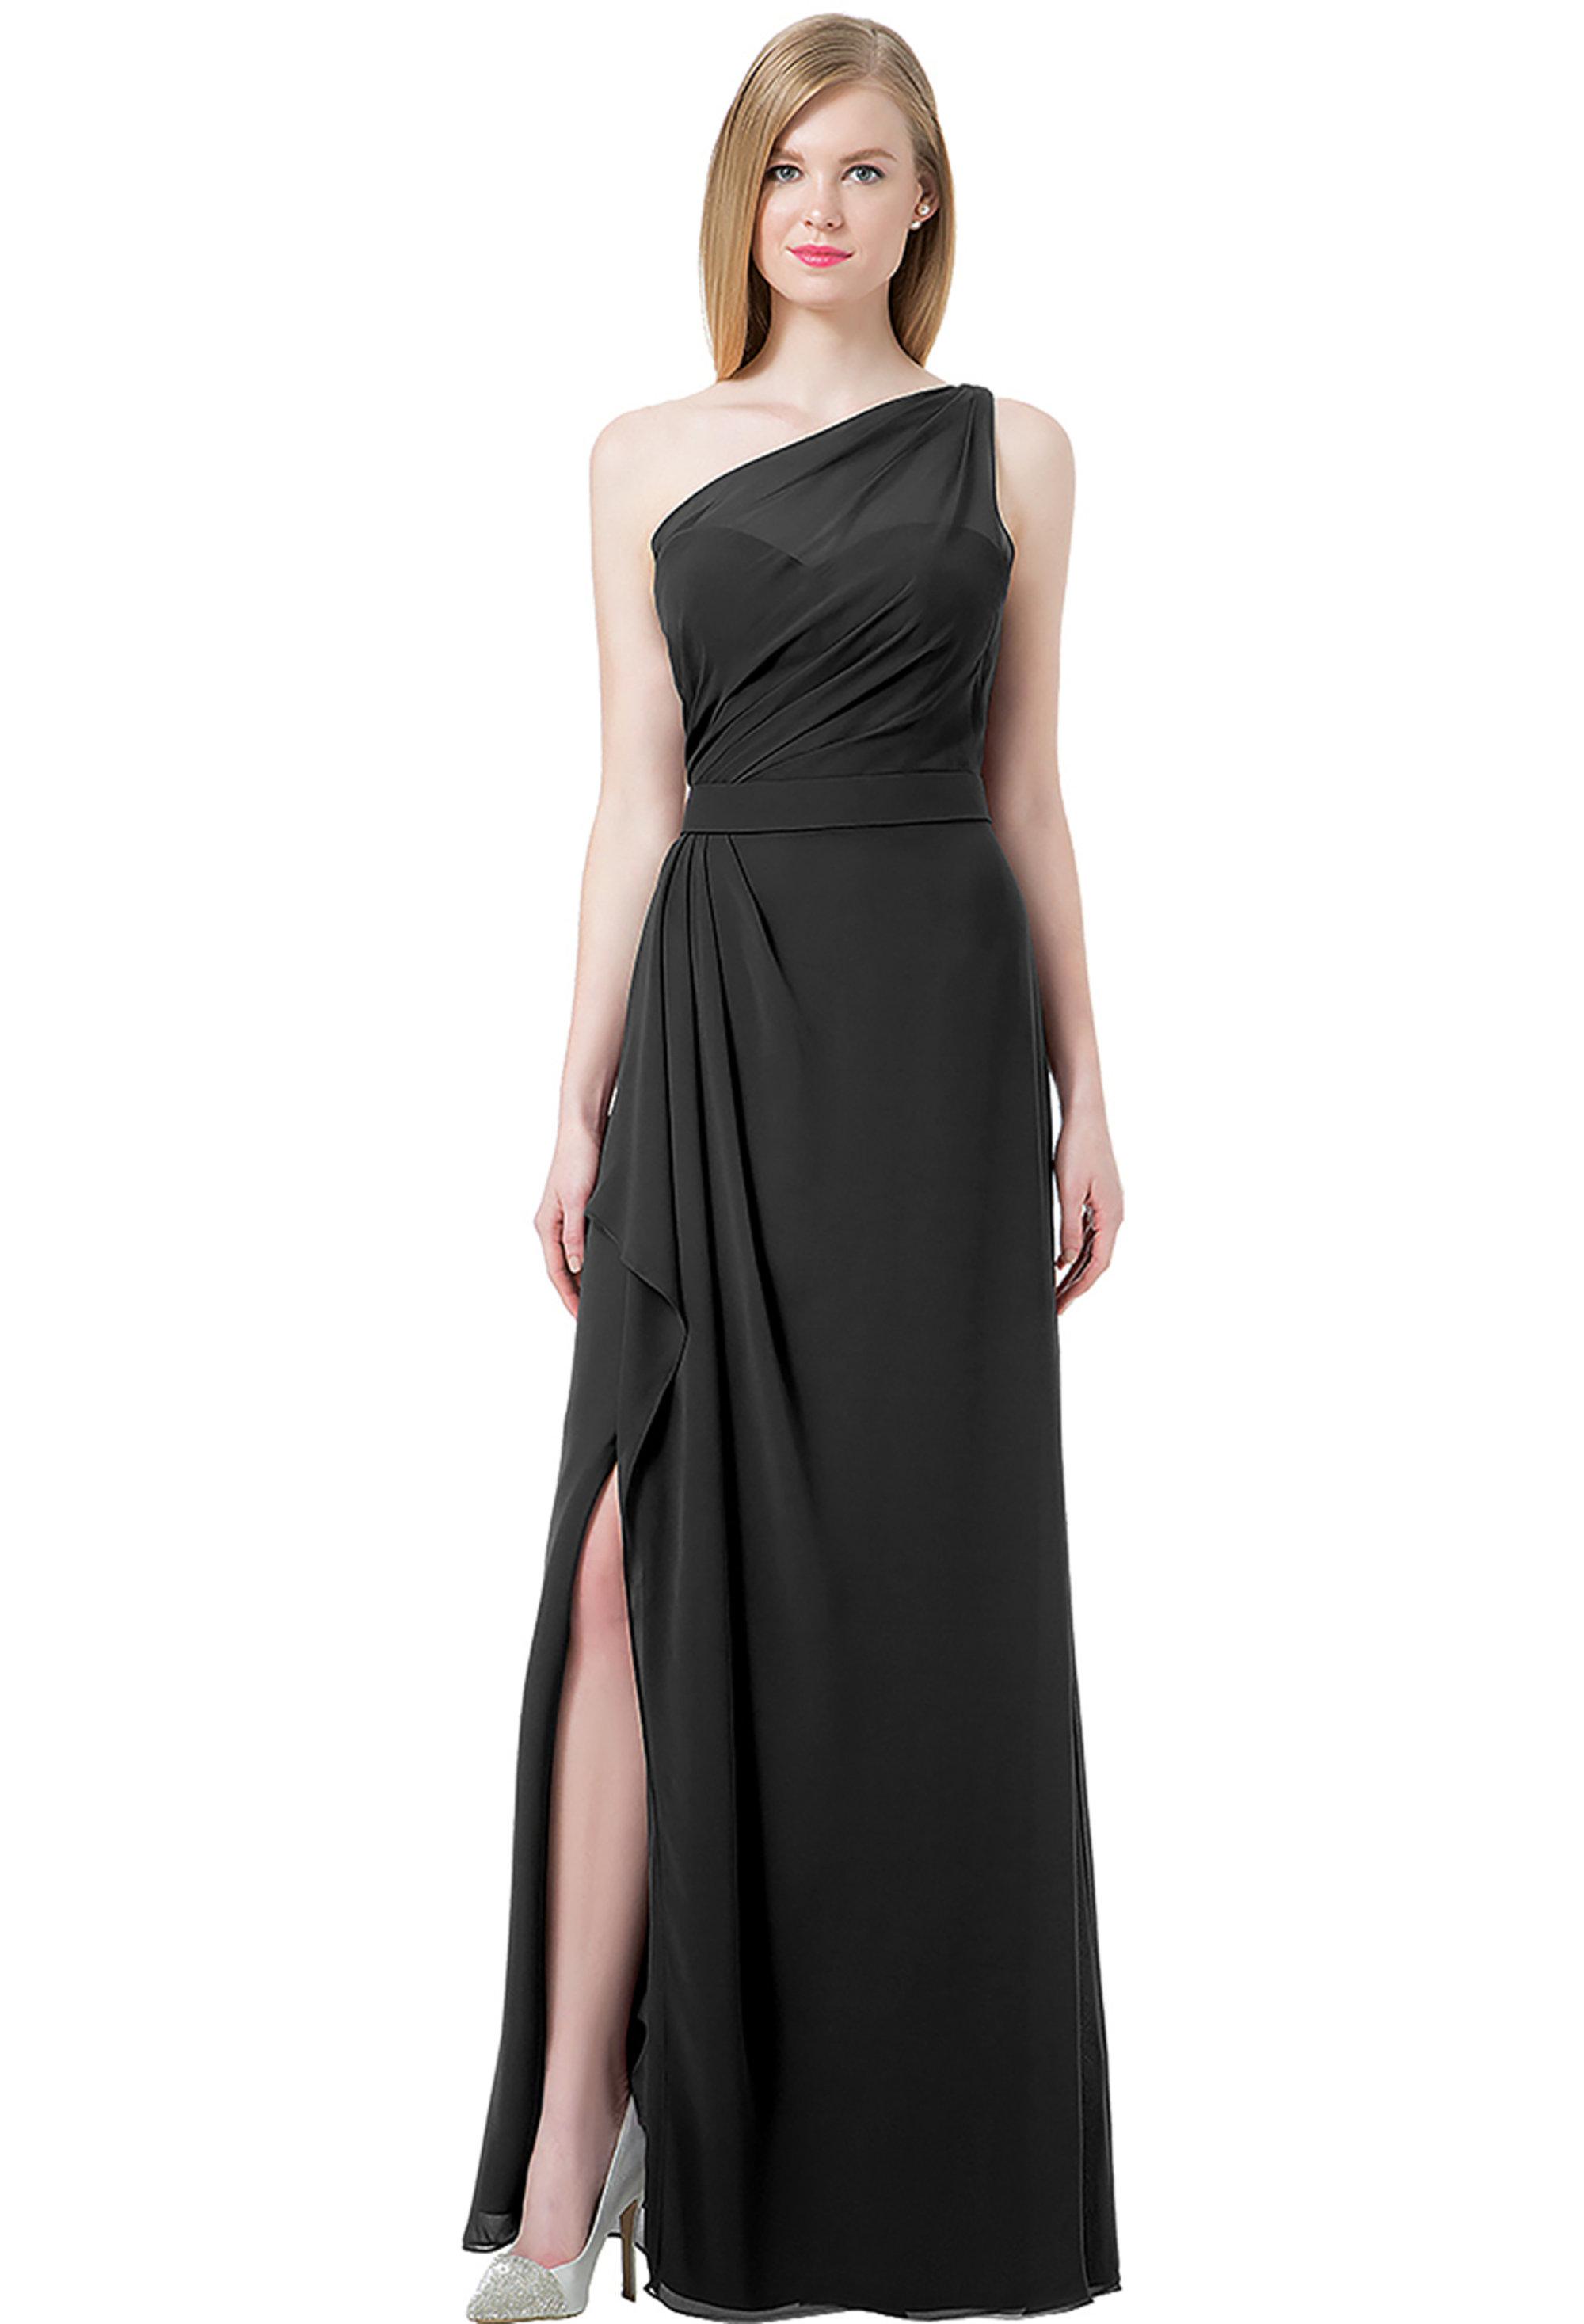 Bill Levkoff Black Chiffon Double Back Spaghetti Strap Side Slit gown, $220.00 Front